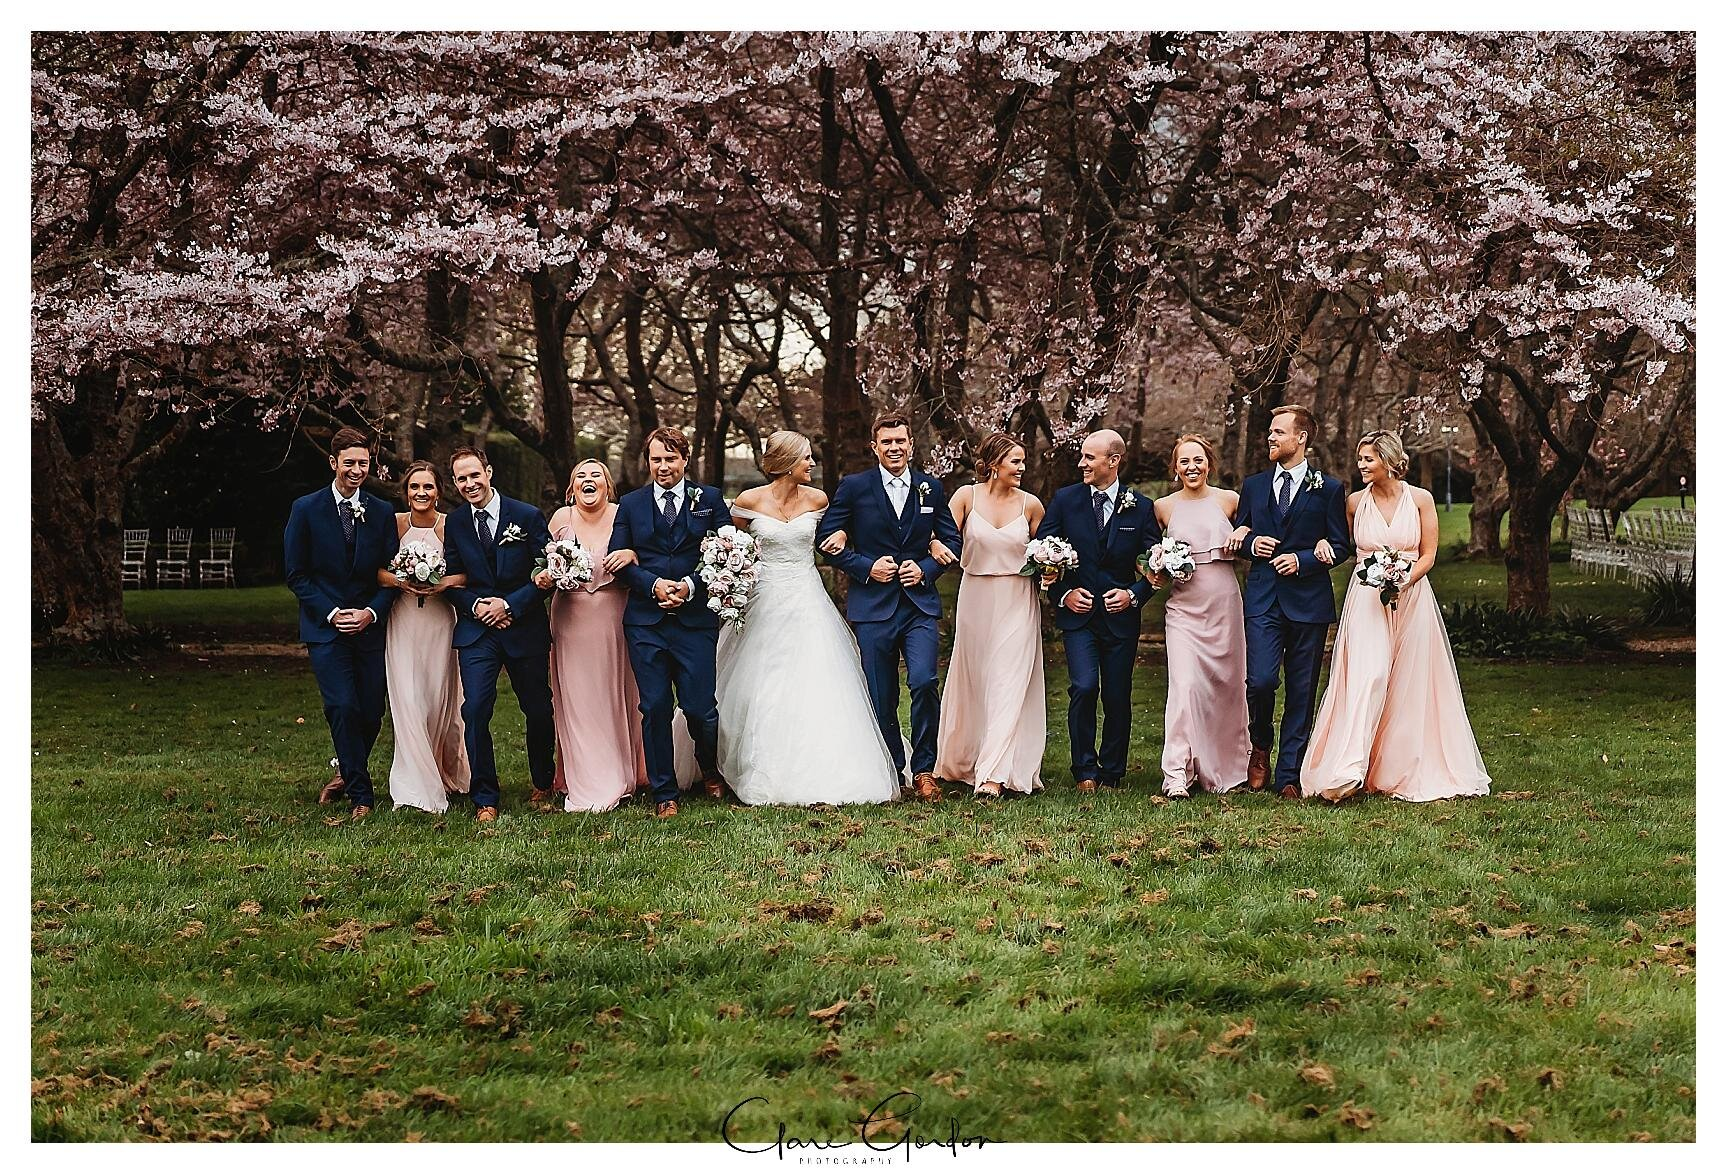 Henley-Hotel-Cherry-blossom-wedding-photos (60).jpg